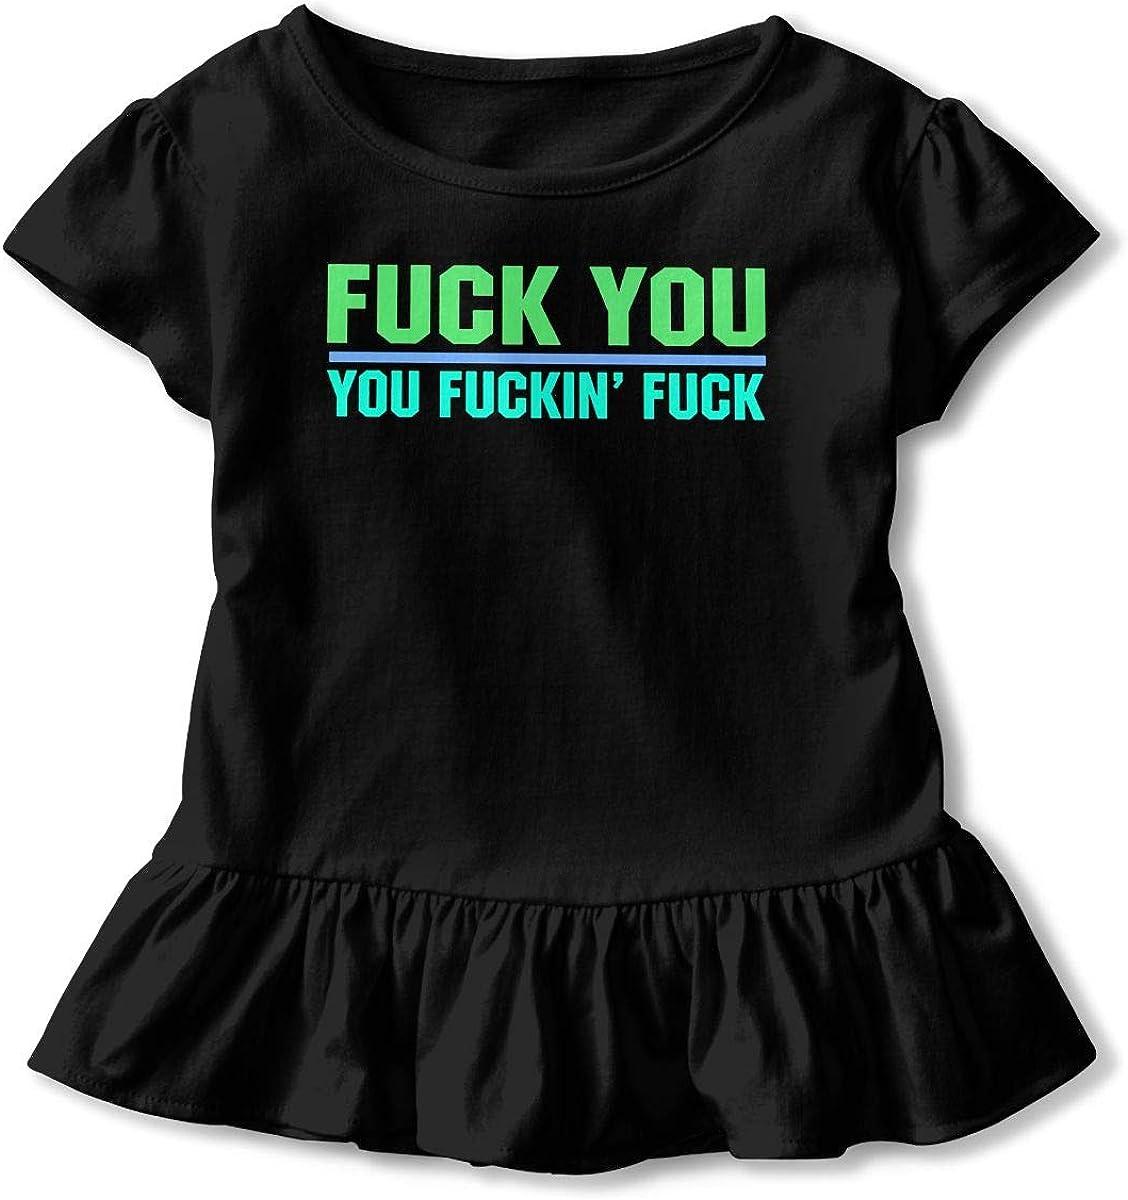 SC/_VD08 Fuck You Fuckin Funny Baby Girls Crew Neck T-Shirt Top/&Tee